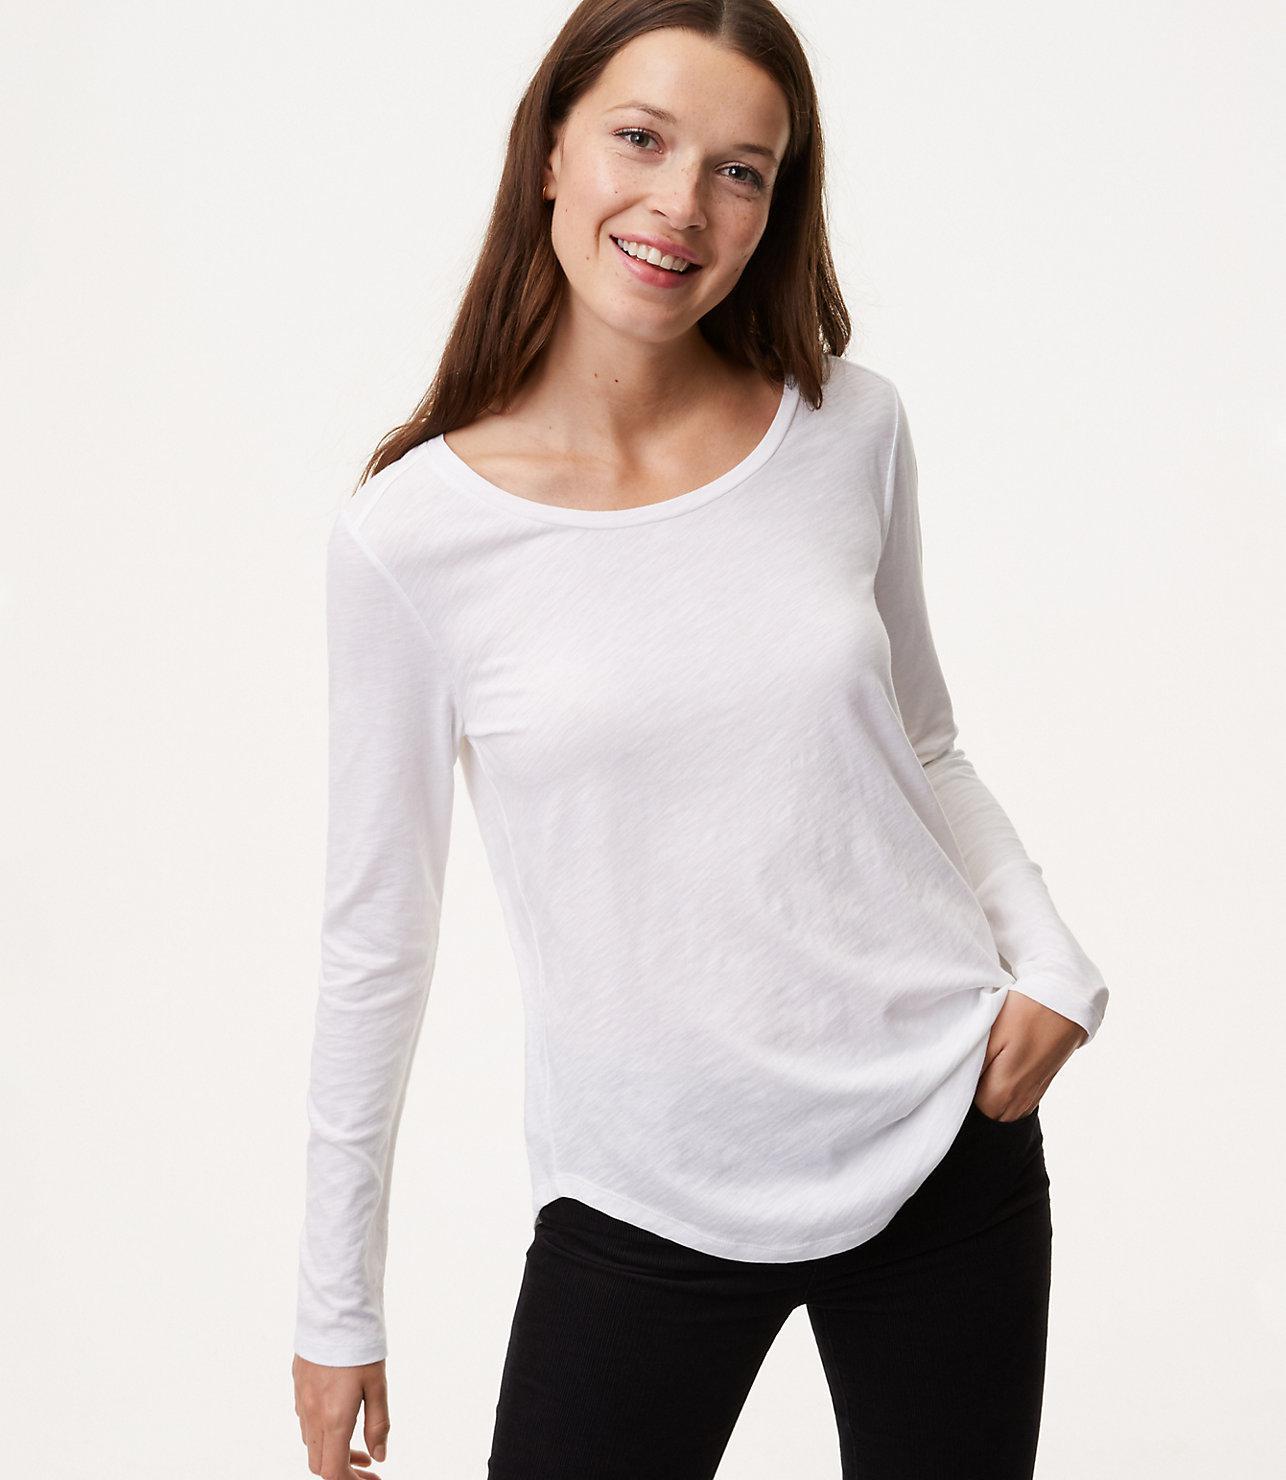 617a0b94e0d61 Lyst - LOFT Long Sleeve Vintage Soft Tee in White